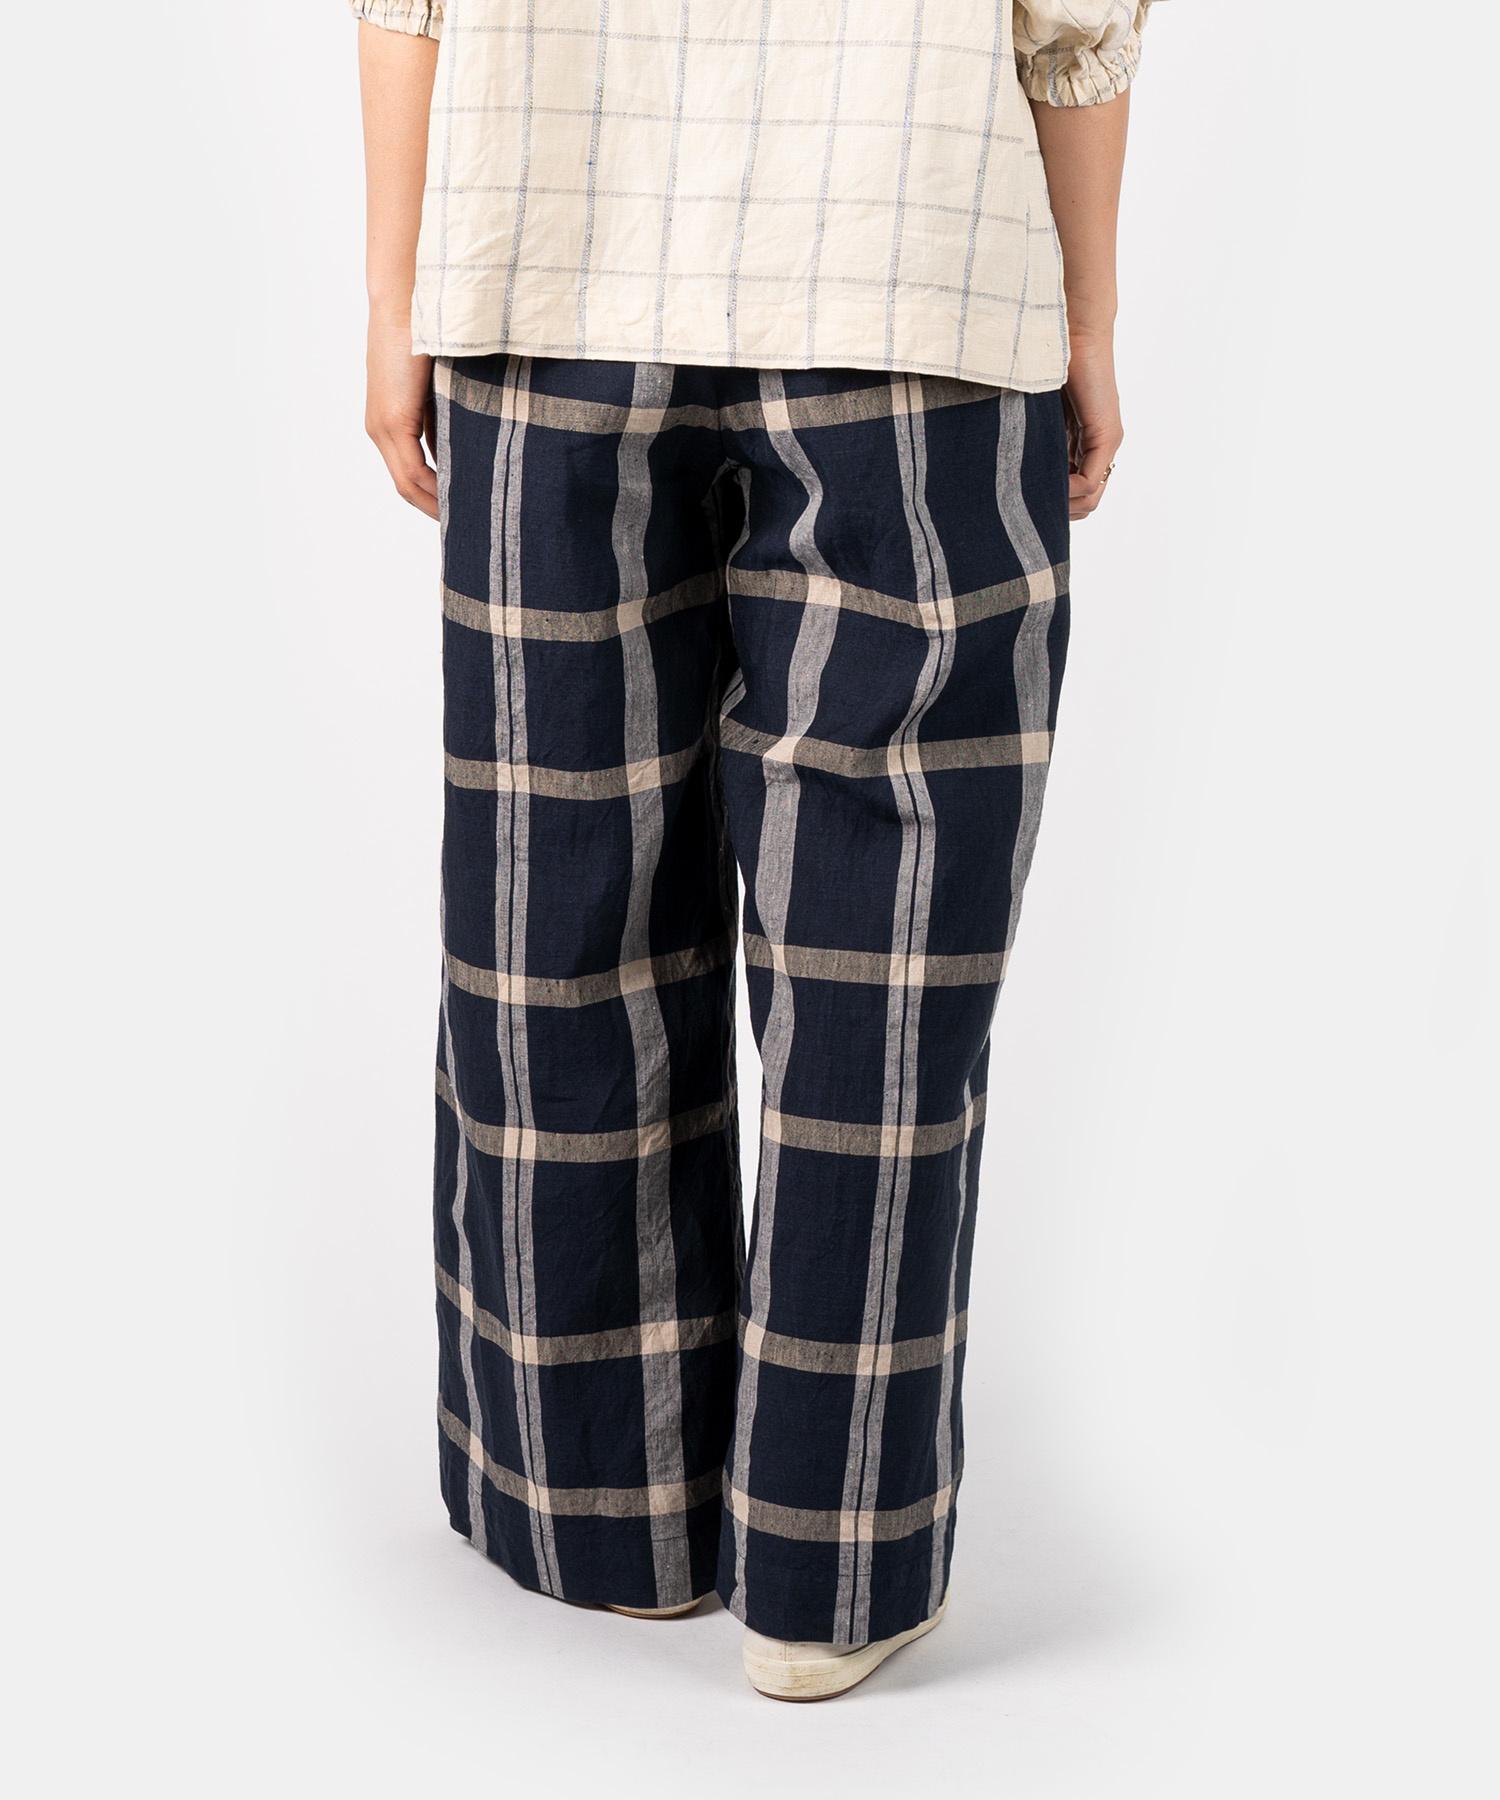 WH Linen 4545 Check Pants-5